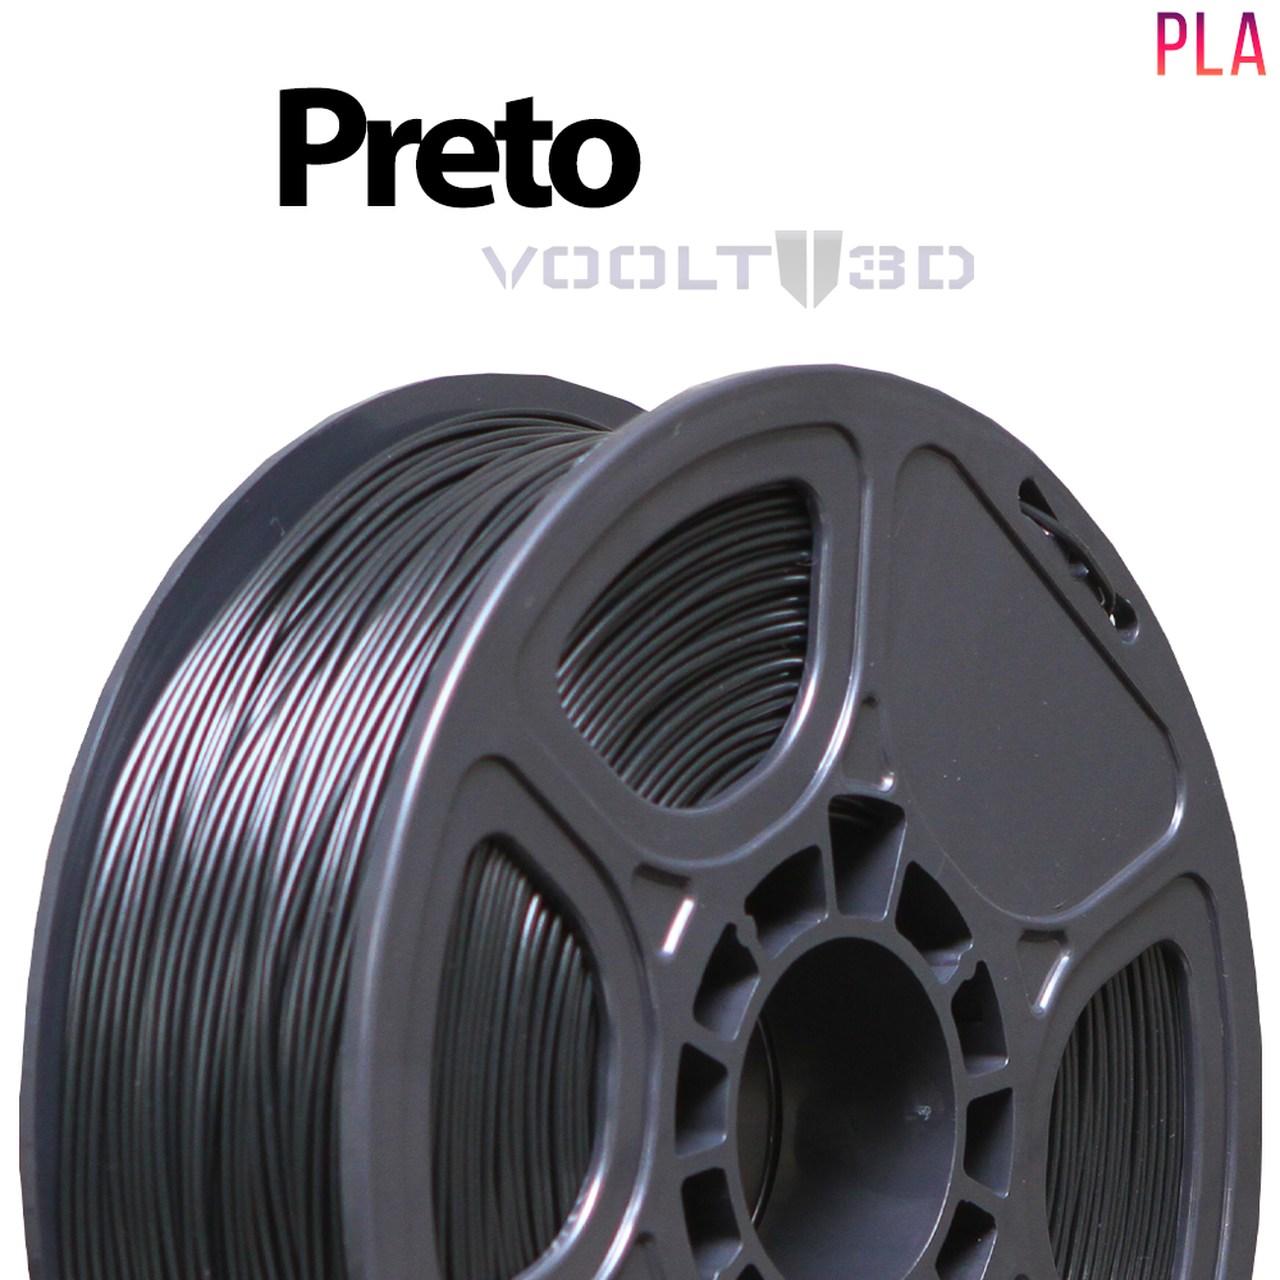 Filamento PLA - Preto - Voolt - 1.75mm - 1kg